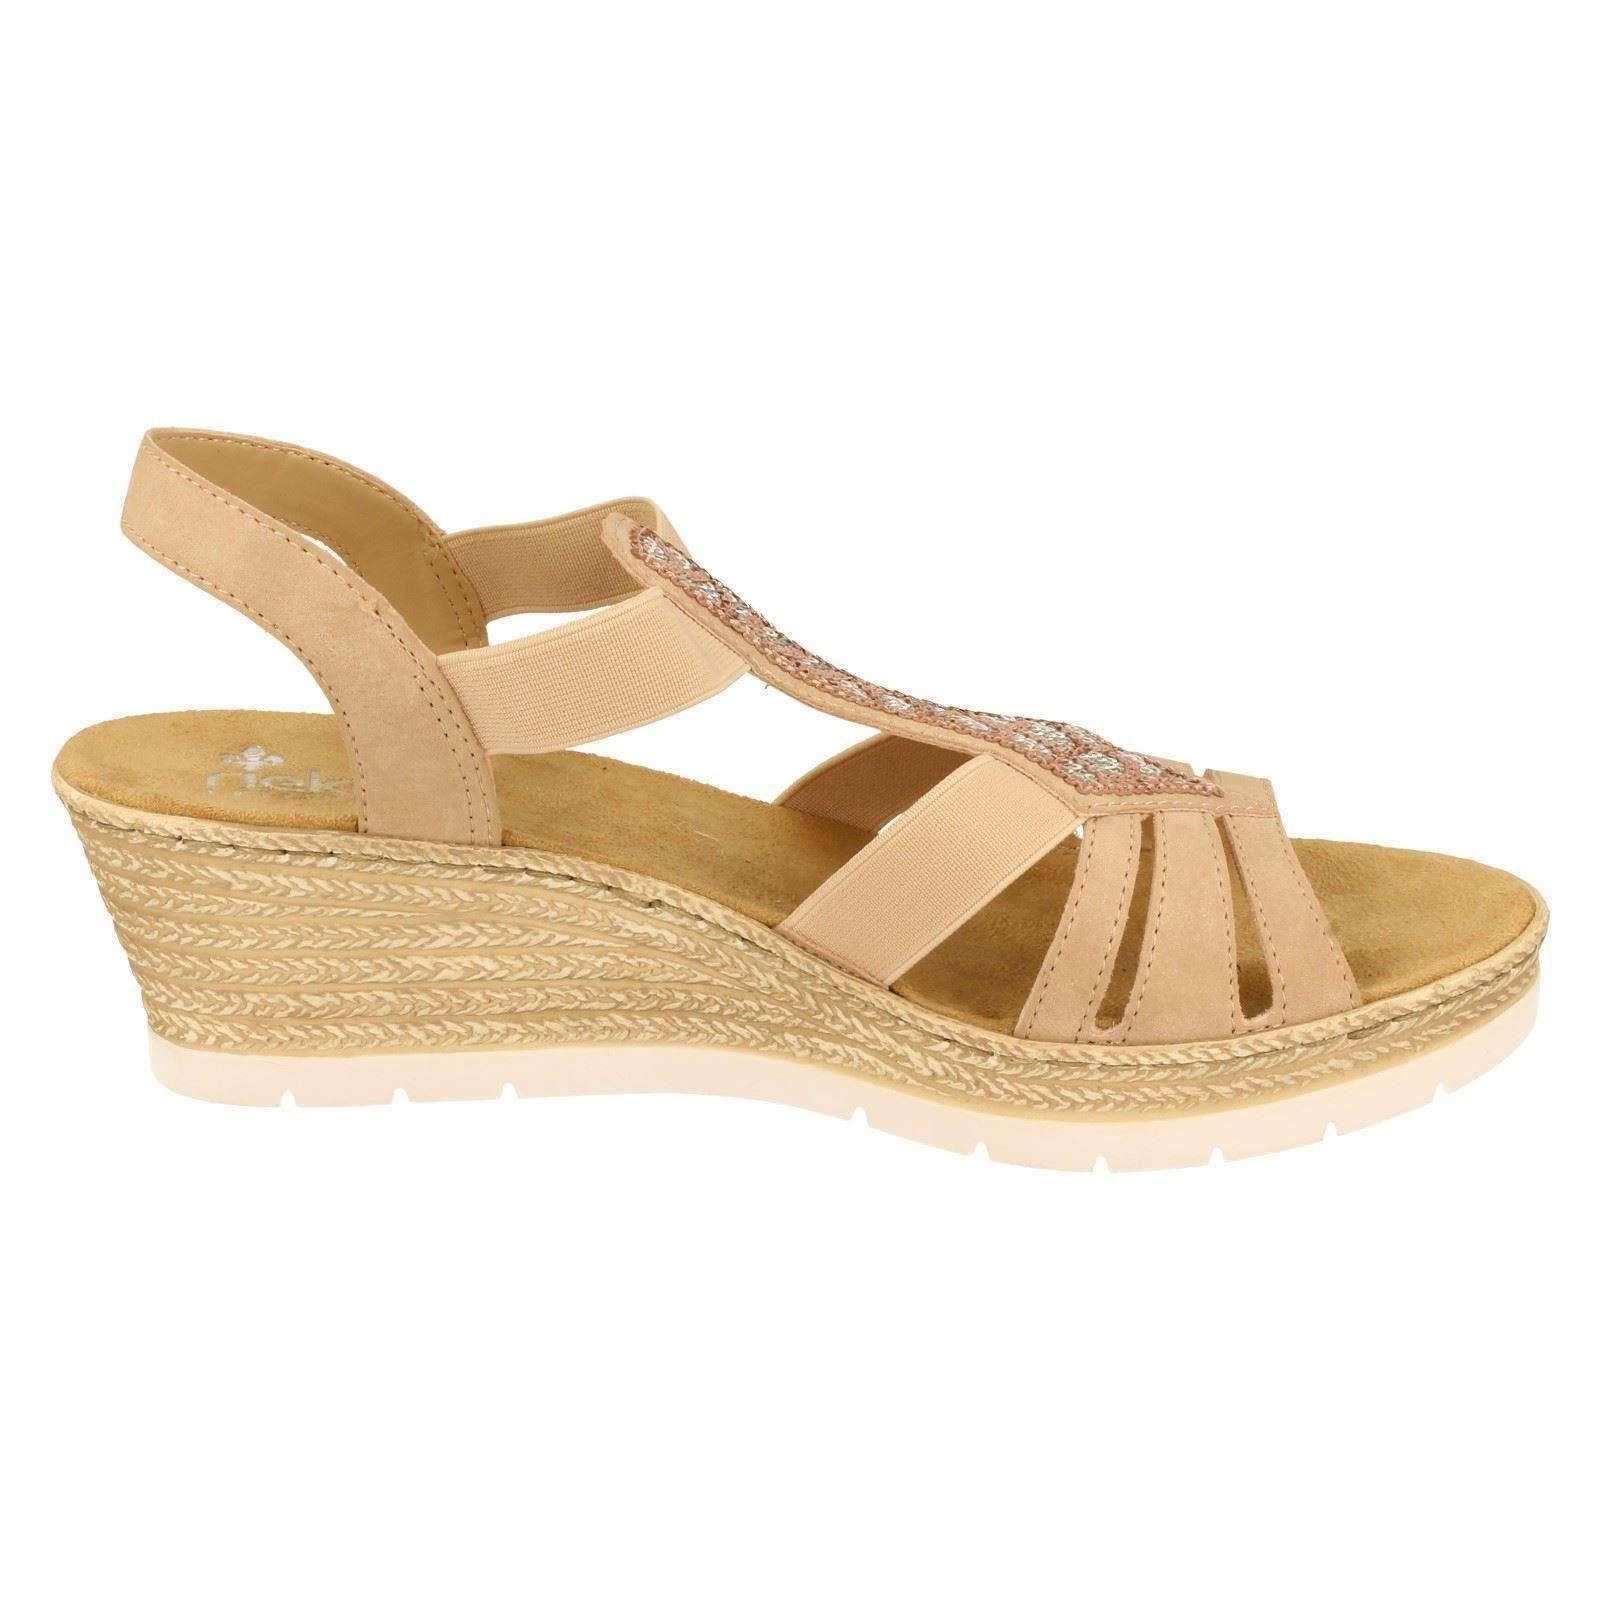 Ladies Rieker Rieker Rieker Casual Sandals 61913 4f098a